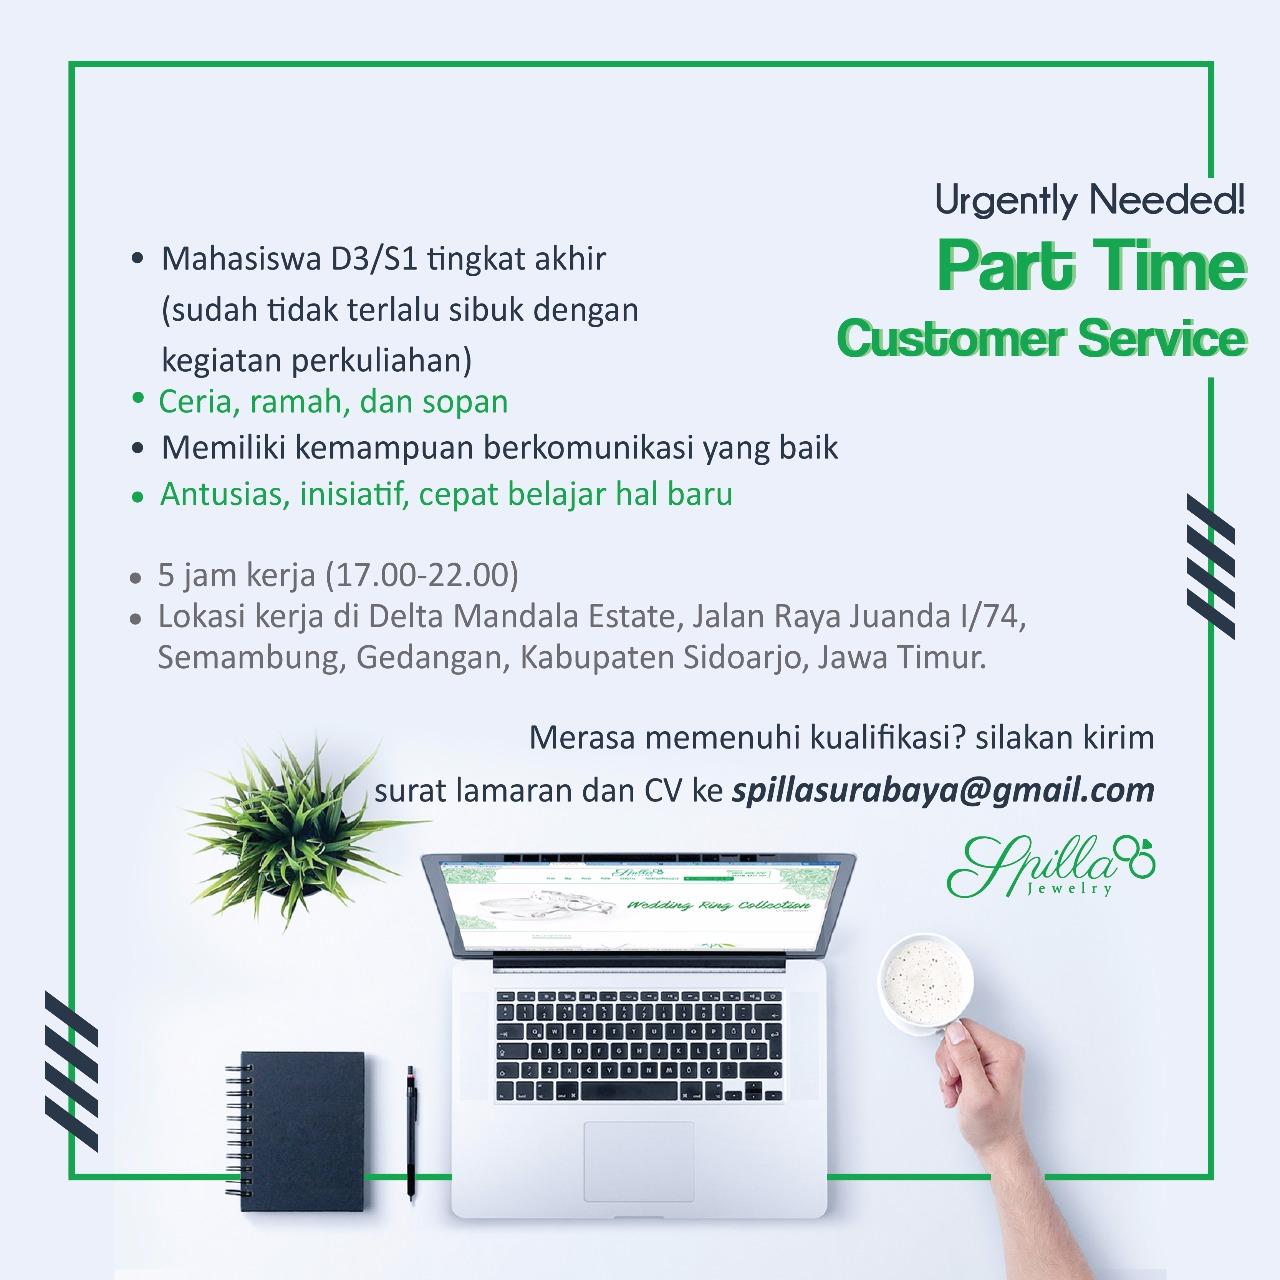 Lowongan Part Time Customer Service Di Spilla Jewelry Surabaya Portal Info Lowongan Kerja Surabaya Jawa Timur 2020